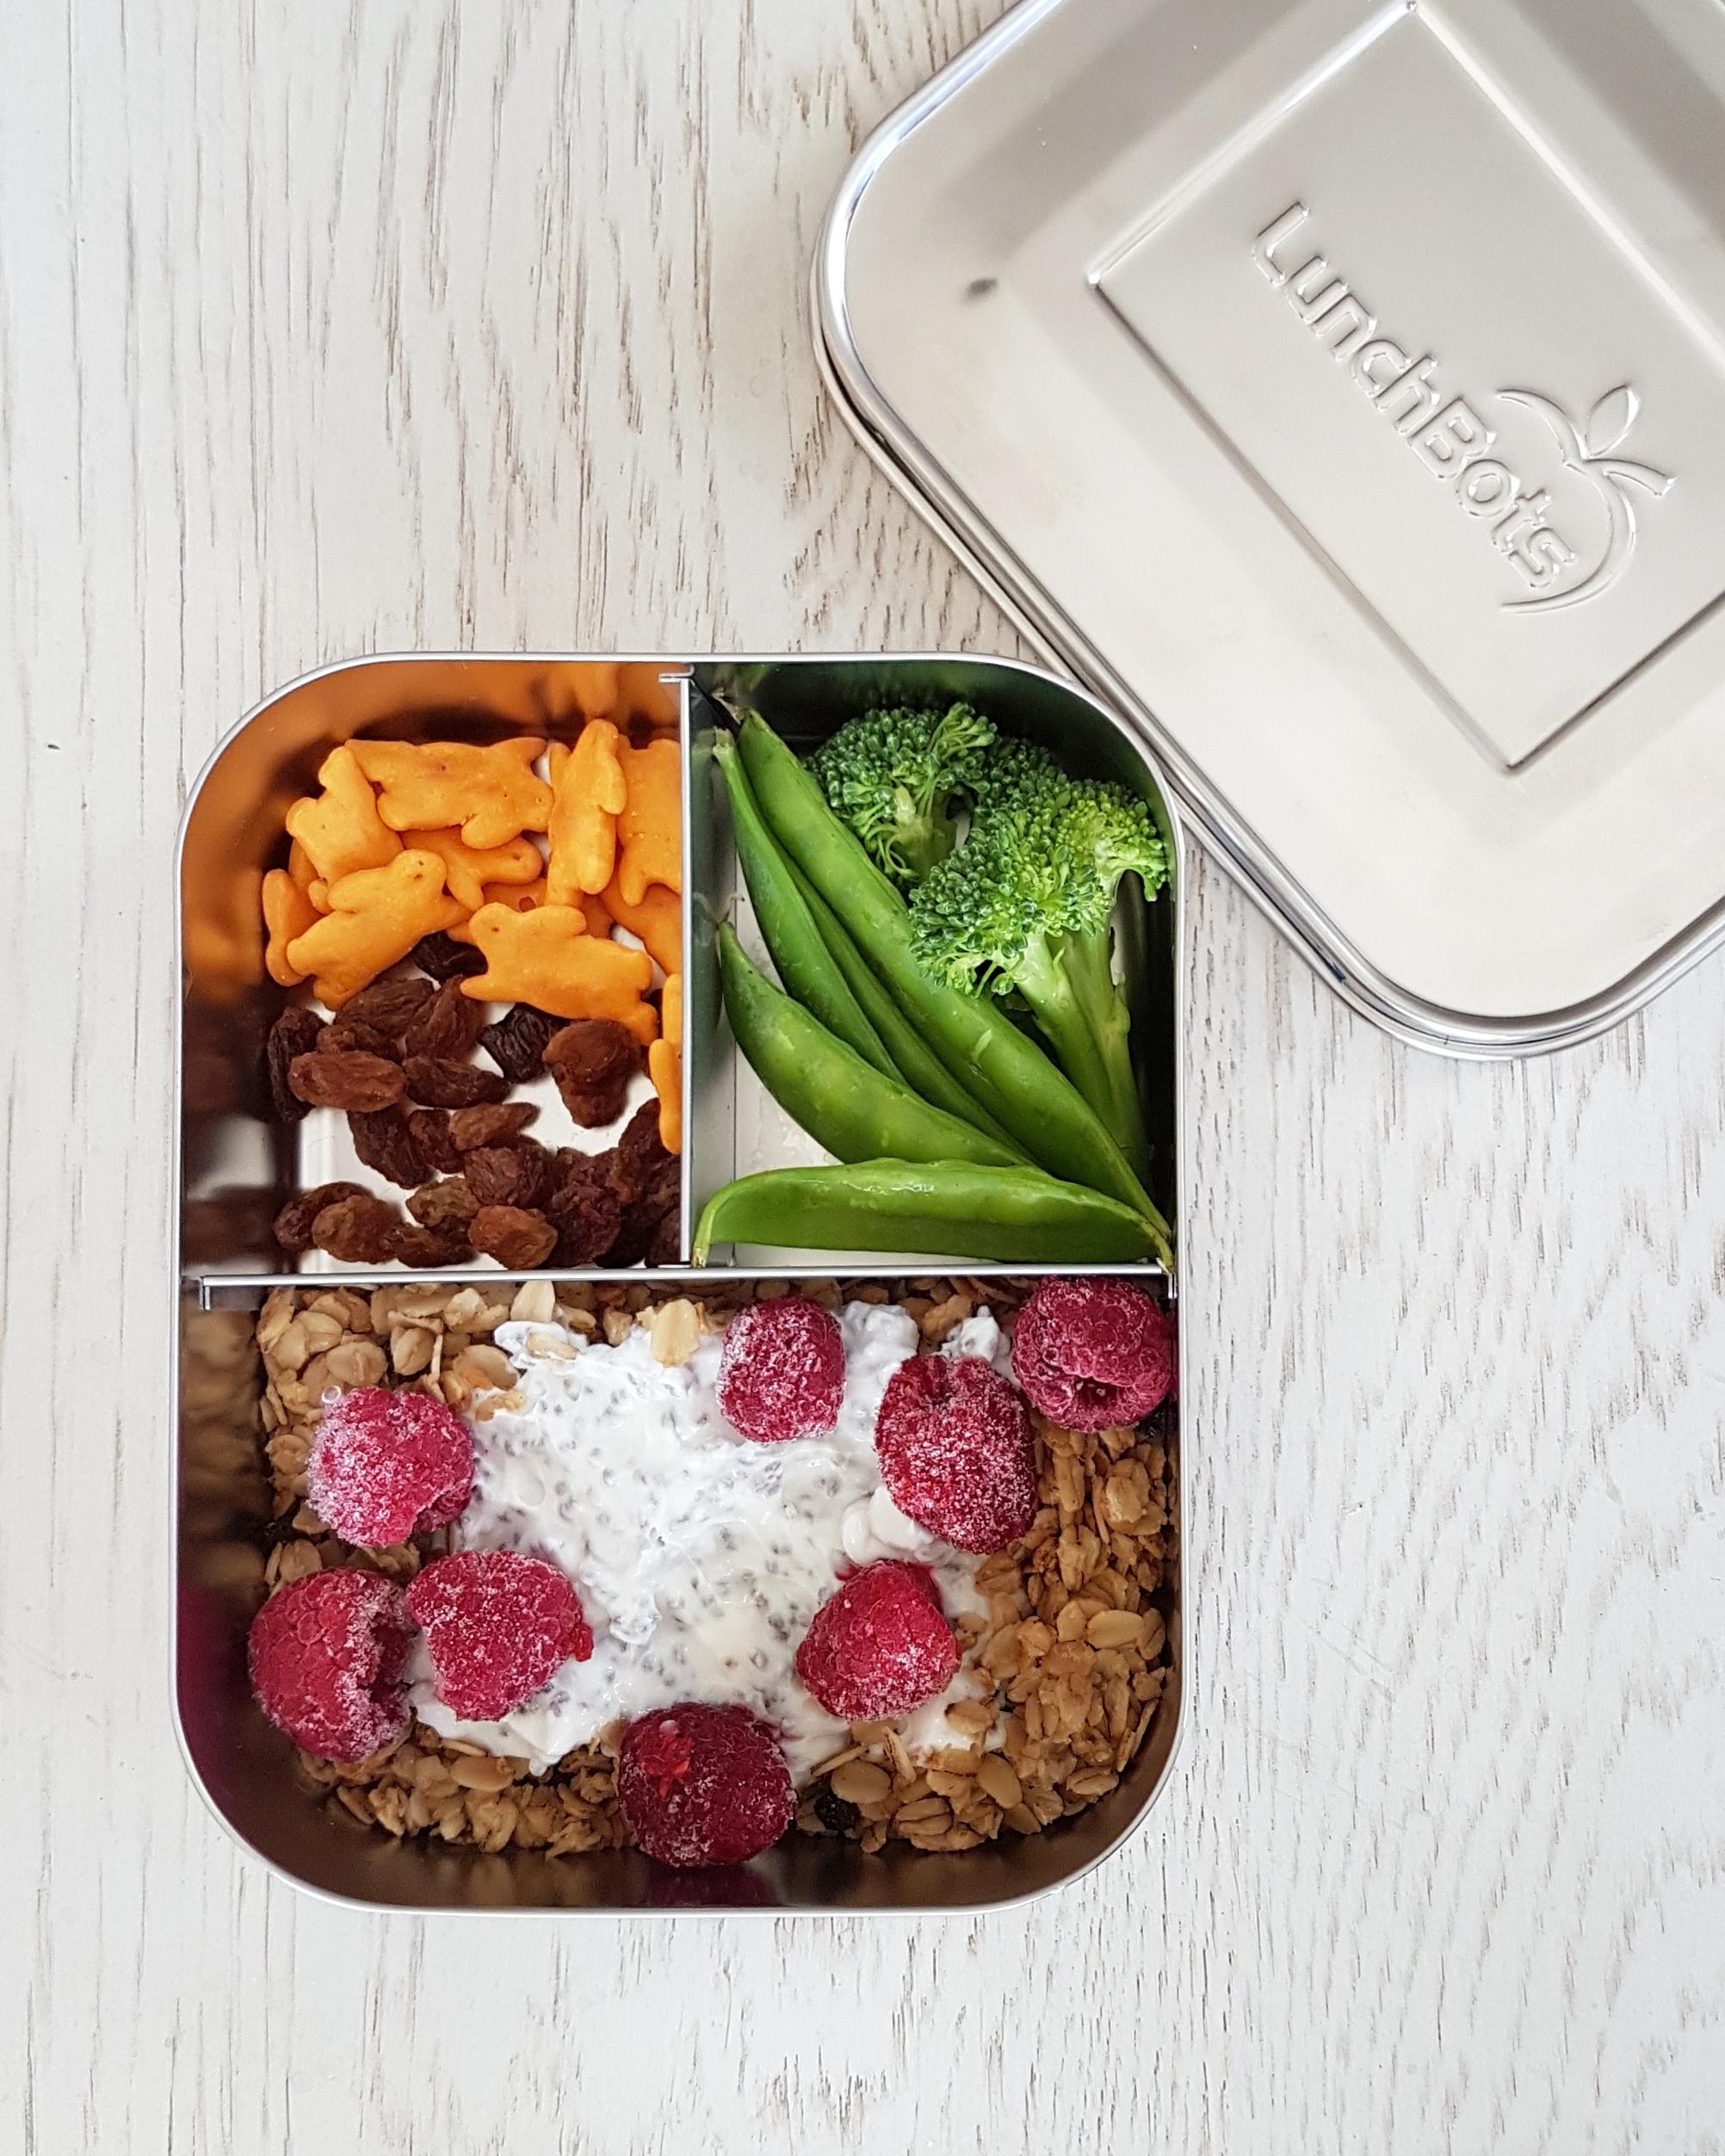 vegetarian lunch ideas by maygen kardash in lunchbots from cravings saskatoon.jpg